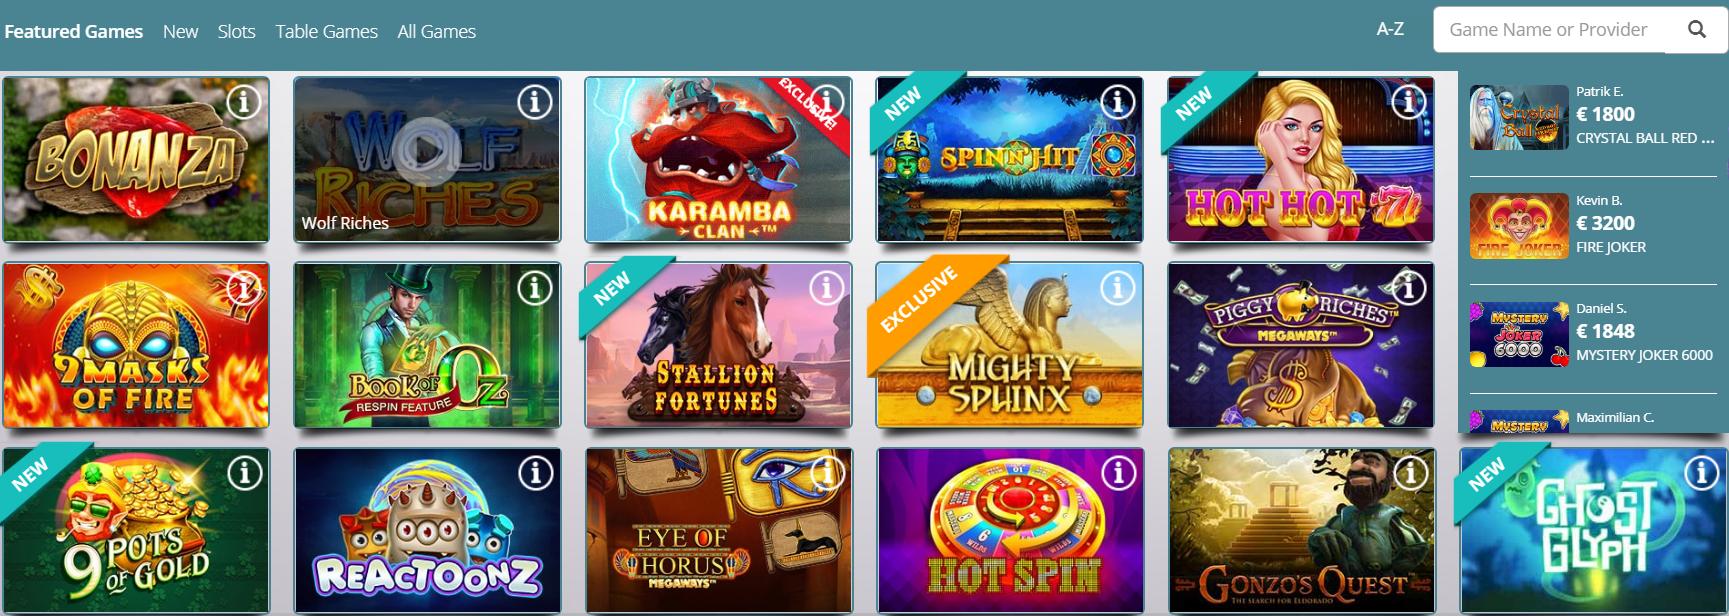 Casino vid löning Karamba 31611